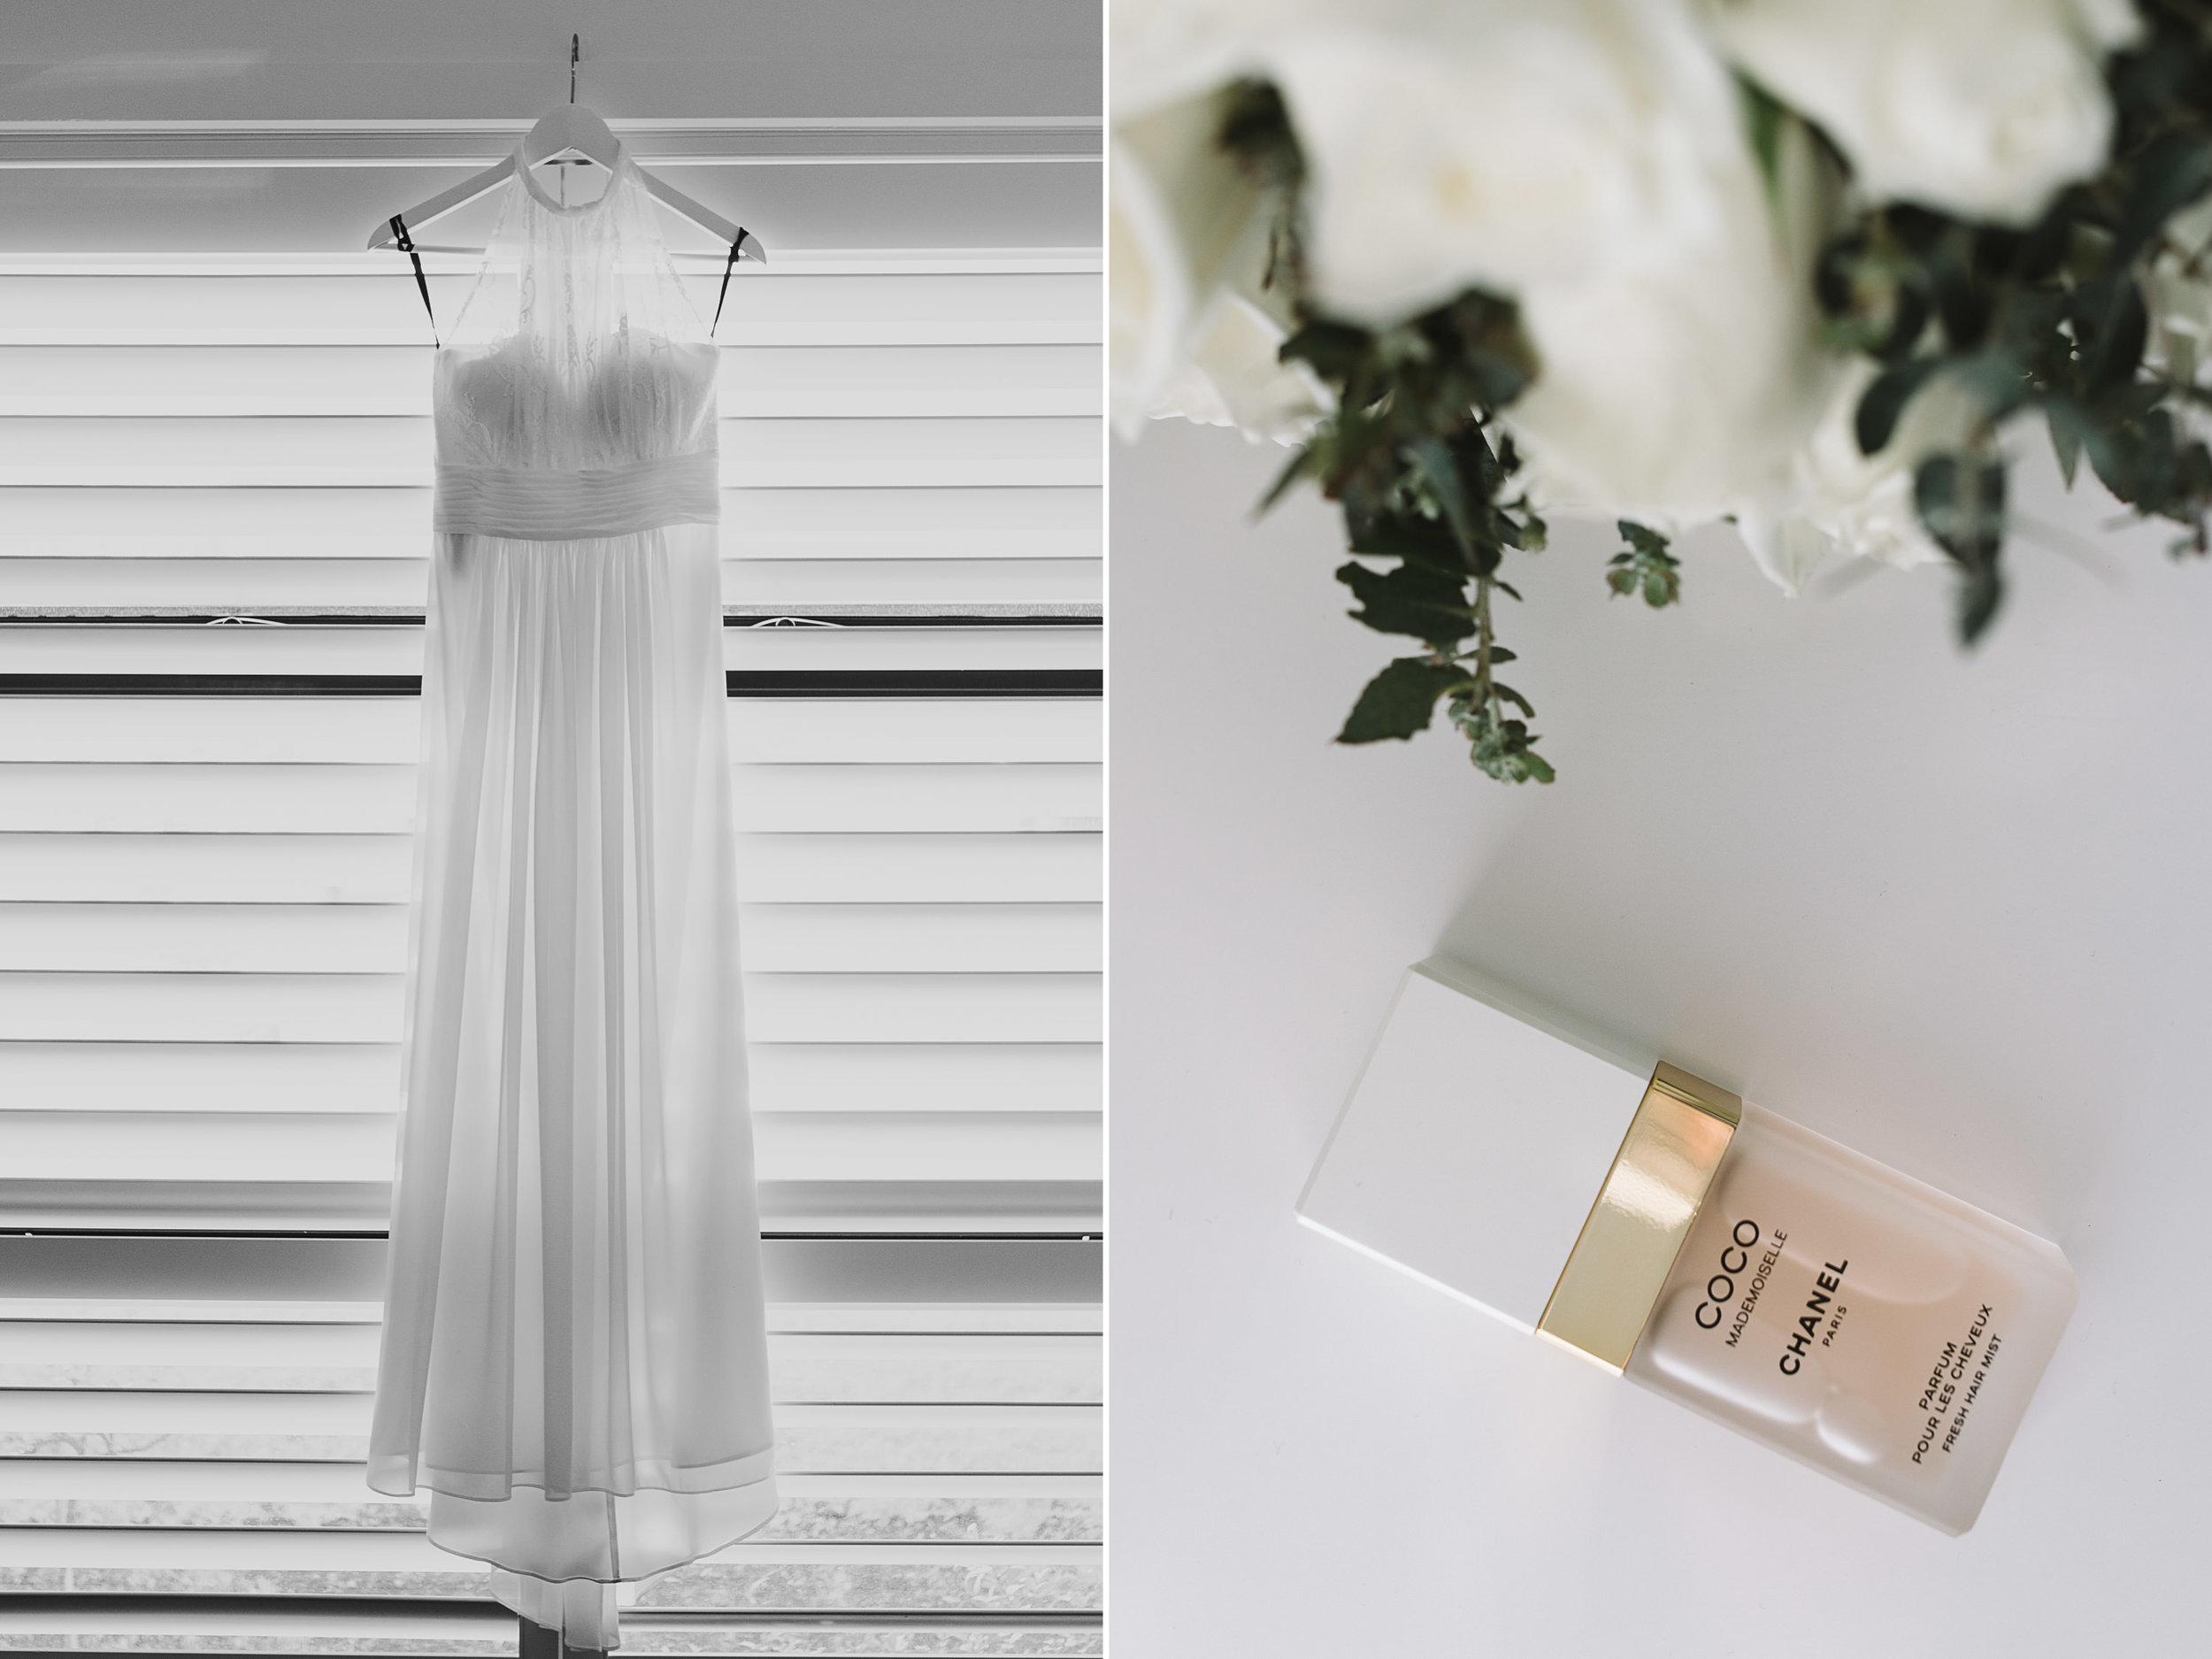 sydney-wedding-photography-wedding-dress-1.jpg